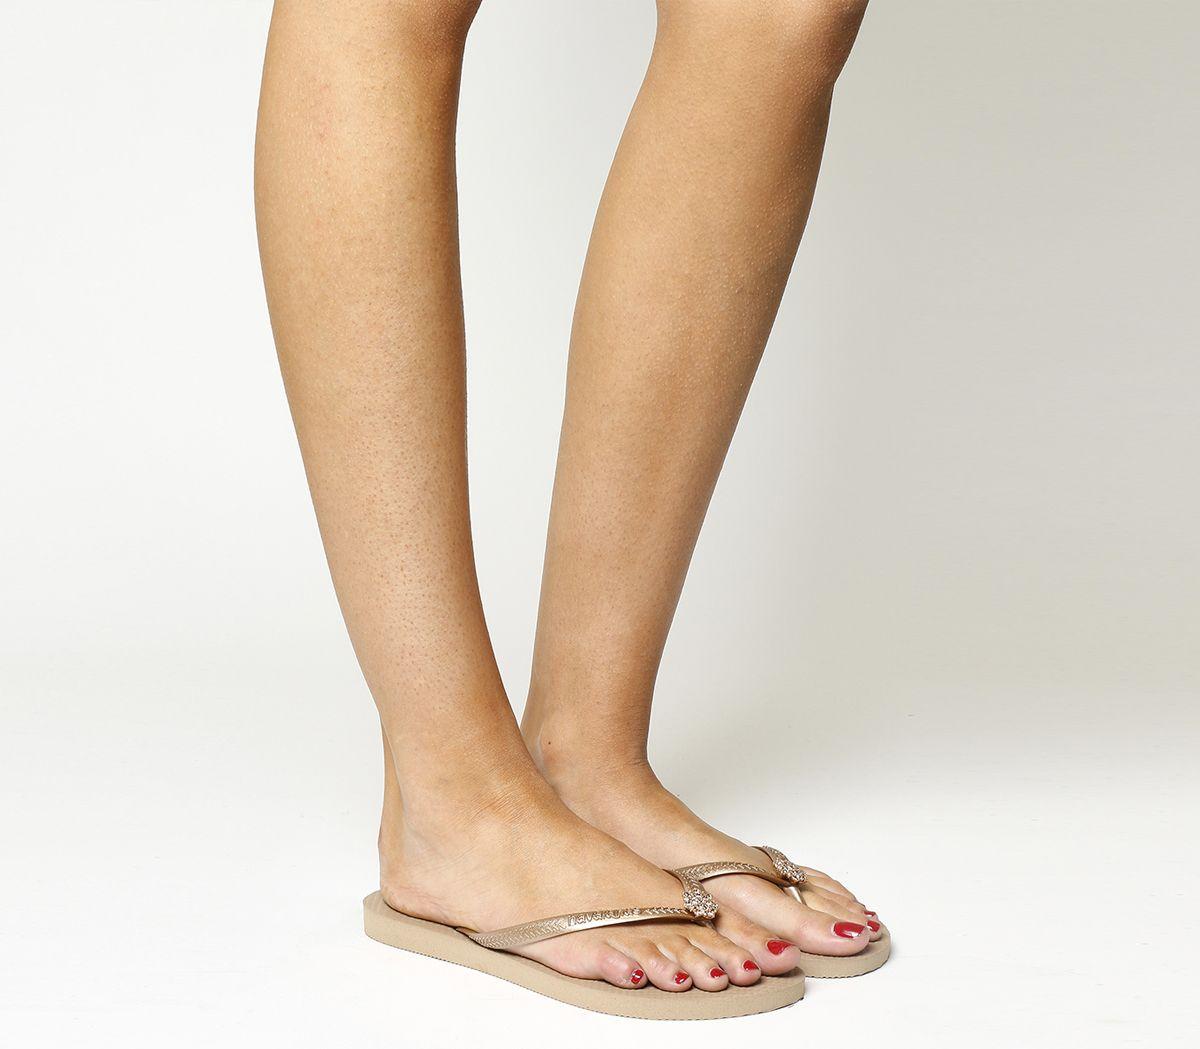 8aeba6c56308 Havaianas Slim Crystal Poem Flip Flop Rose Gold - Sandals